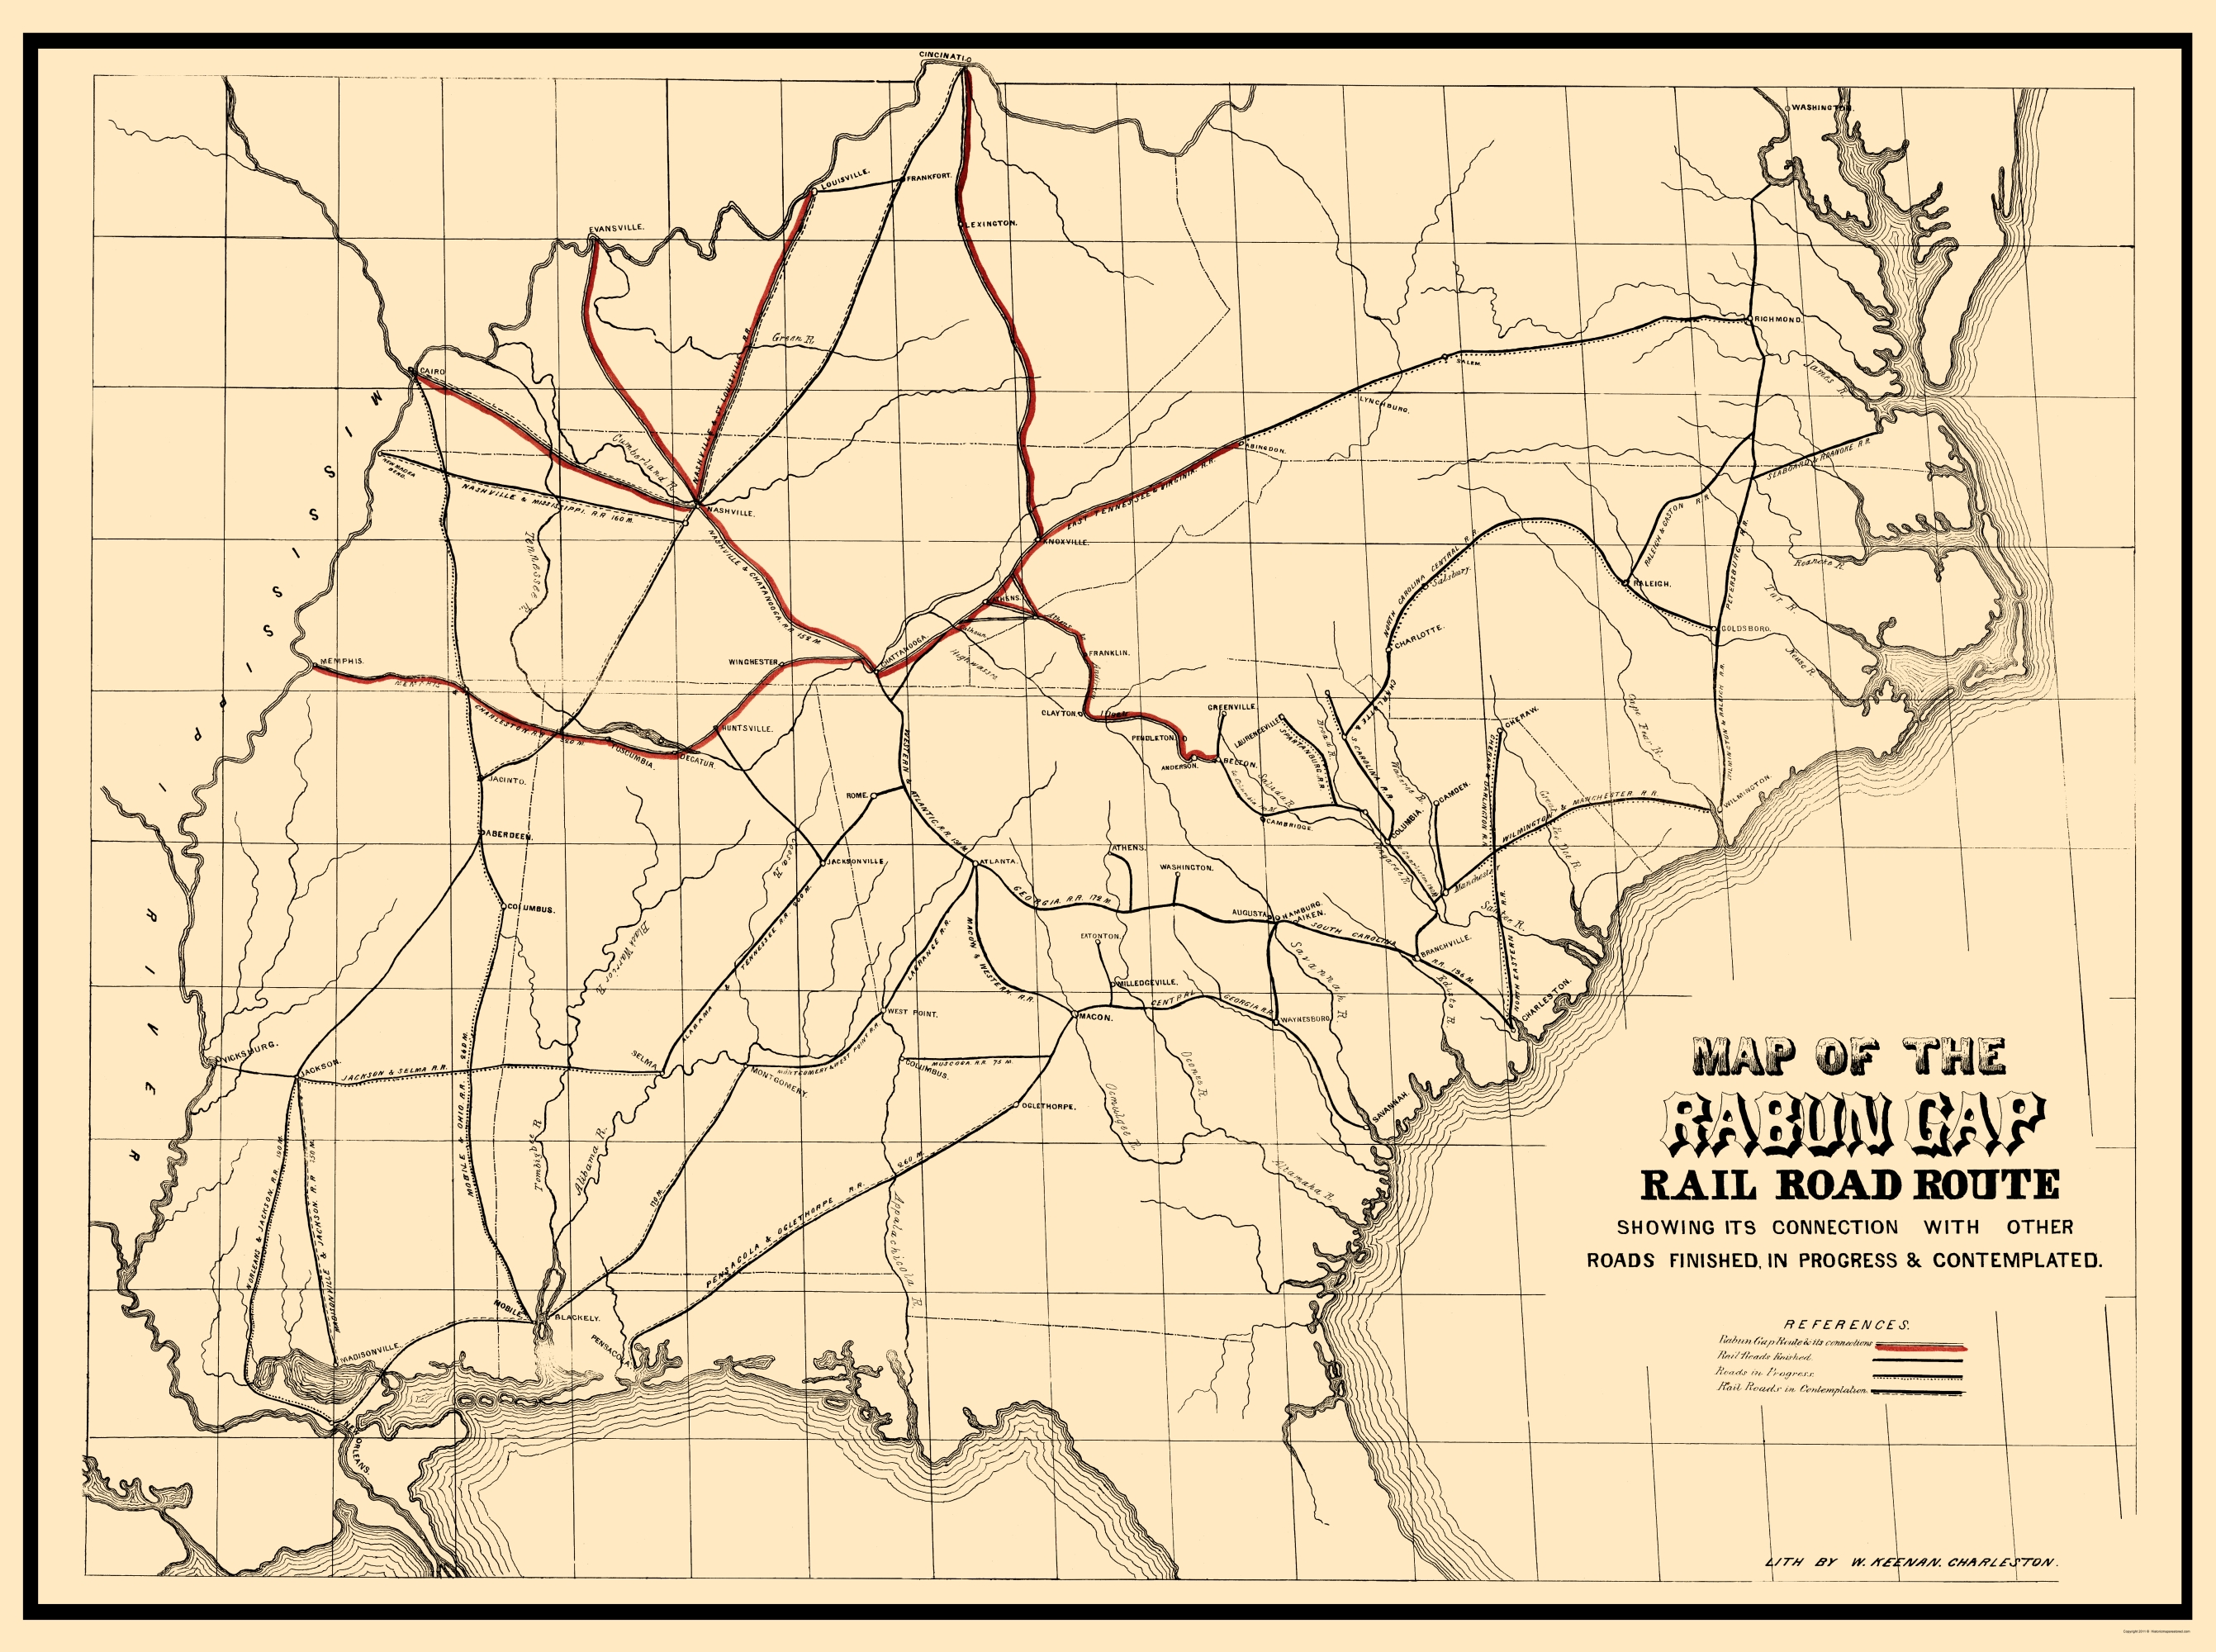 Old Railroad Map Rabun Gap Railroad 1850